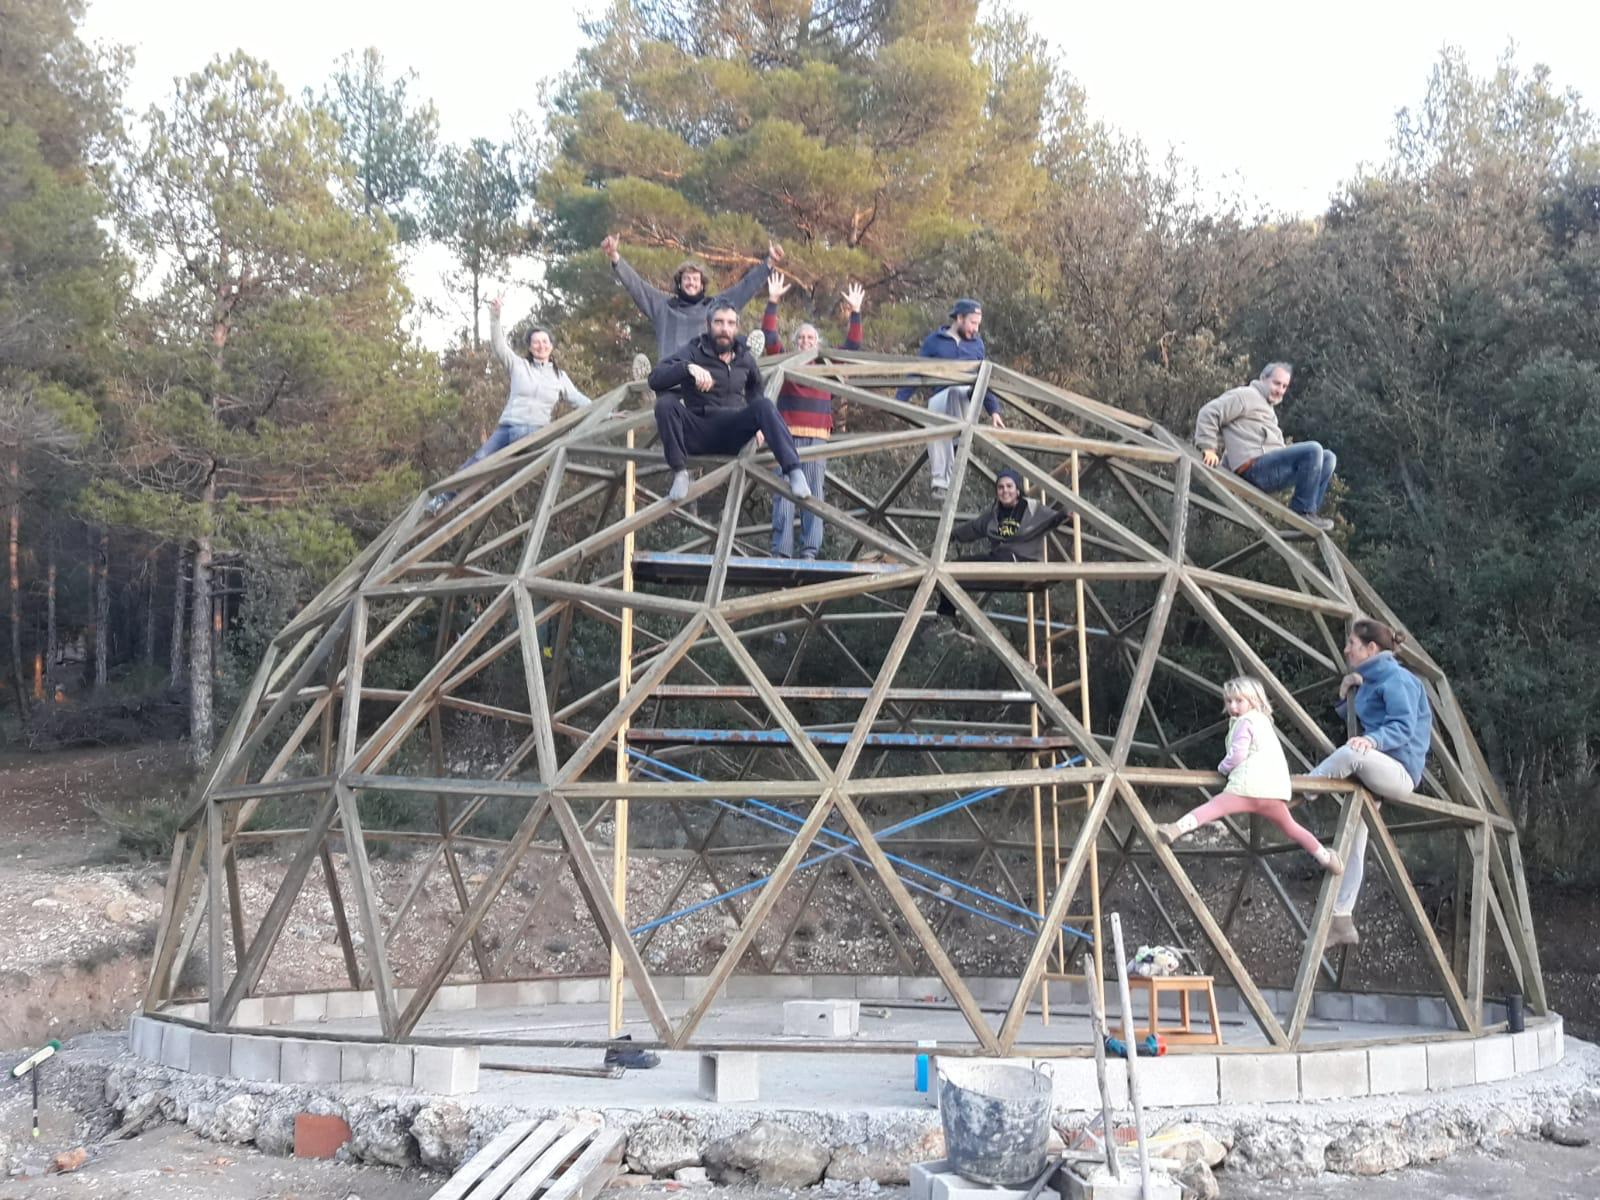 Descansando sobre la cúpula